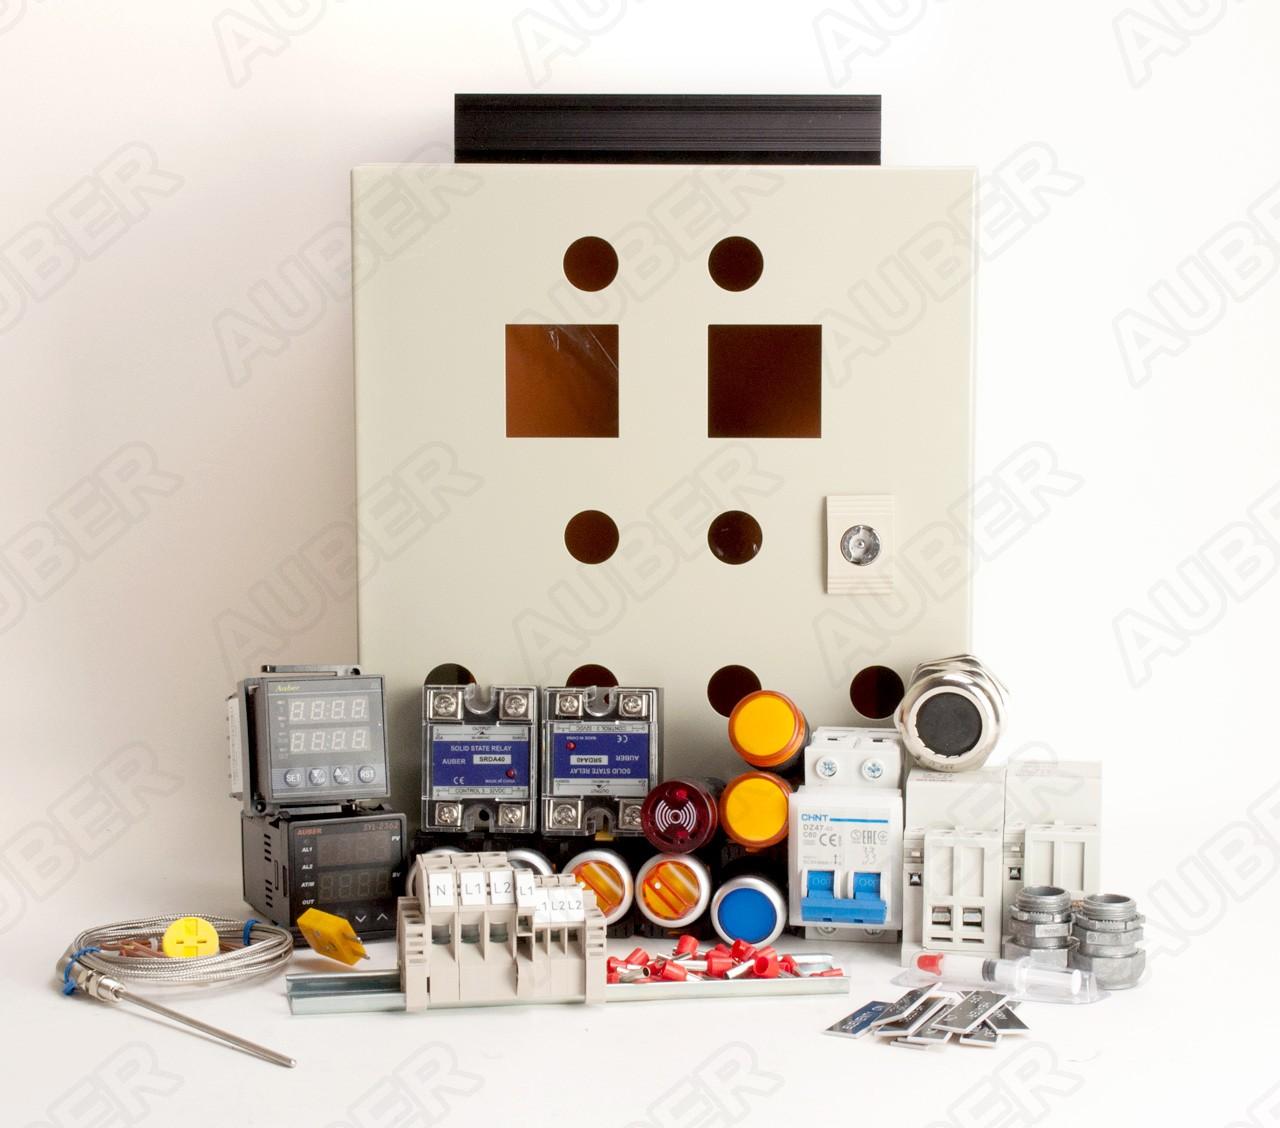 Powder Coating Oven Controller Kit 240v 50a w [kit Pco2 Pid Wiring Diagram Powder Coat